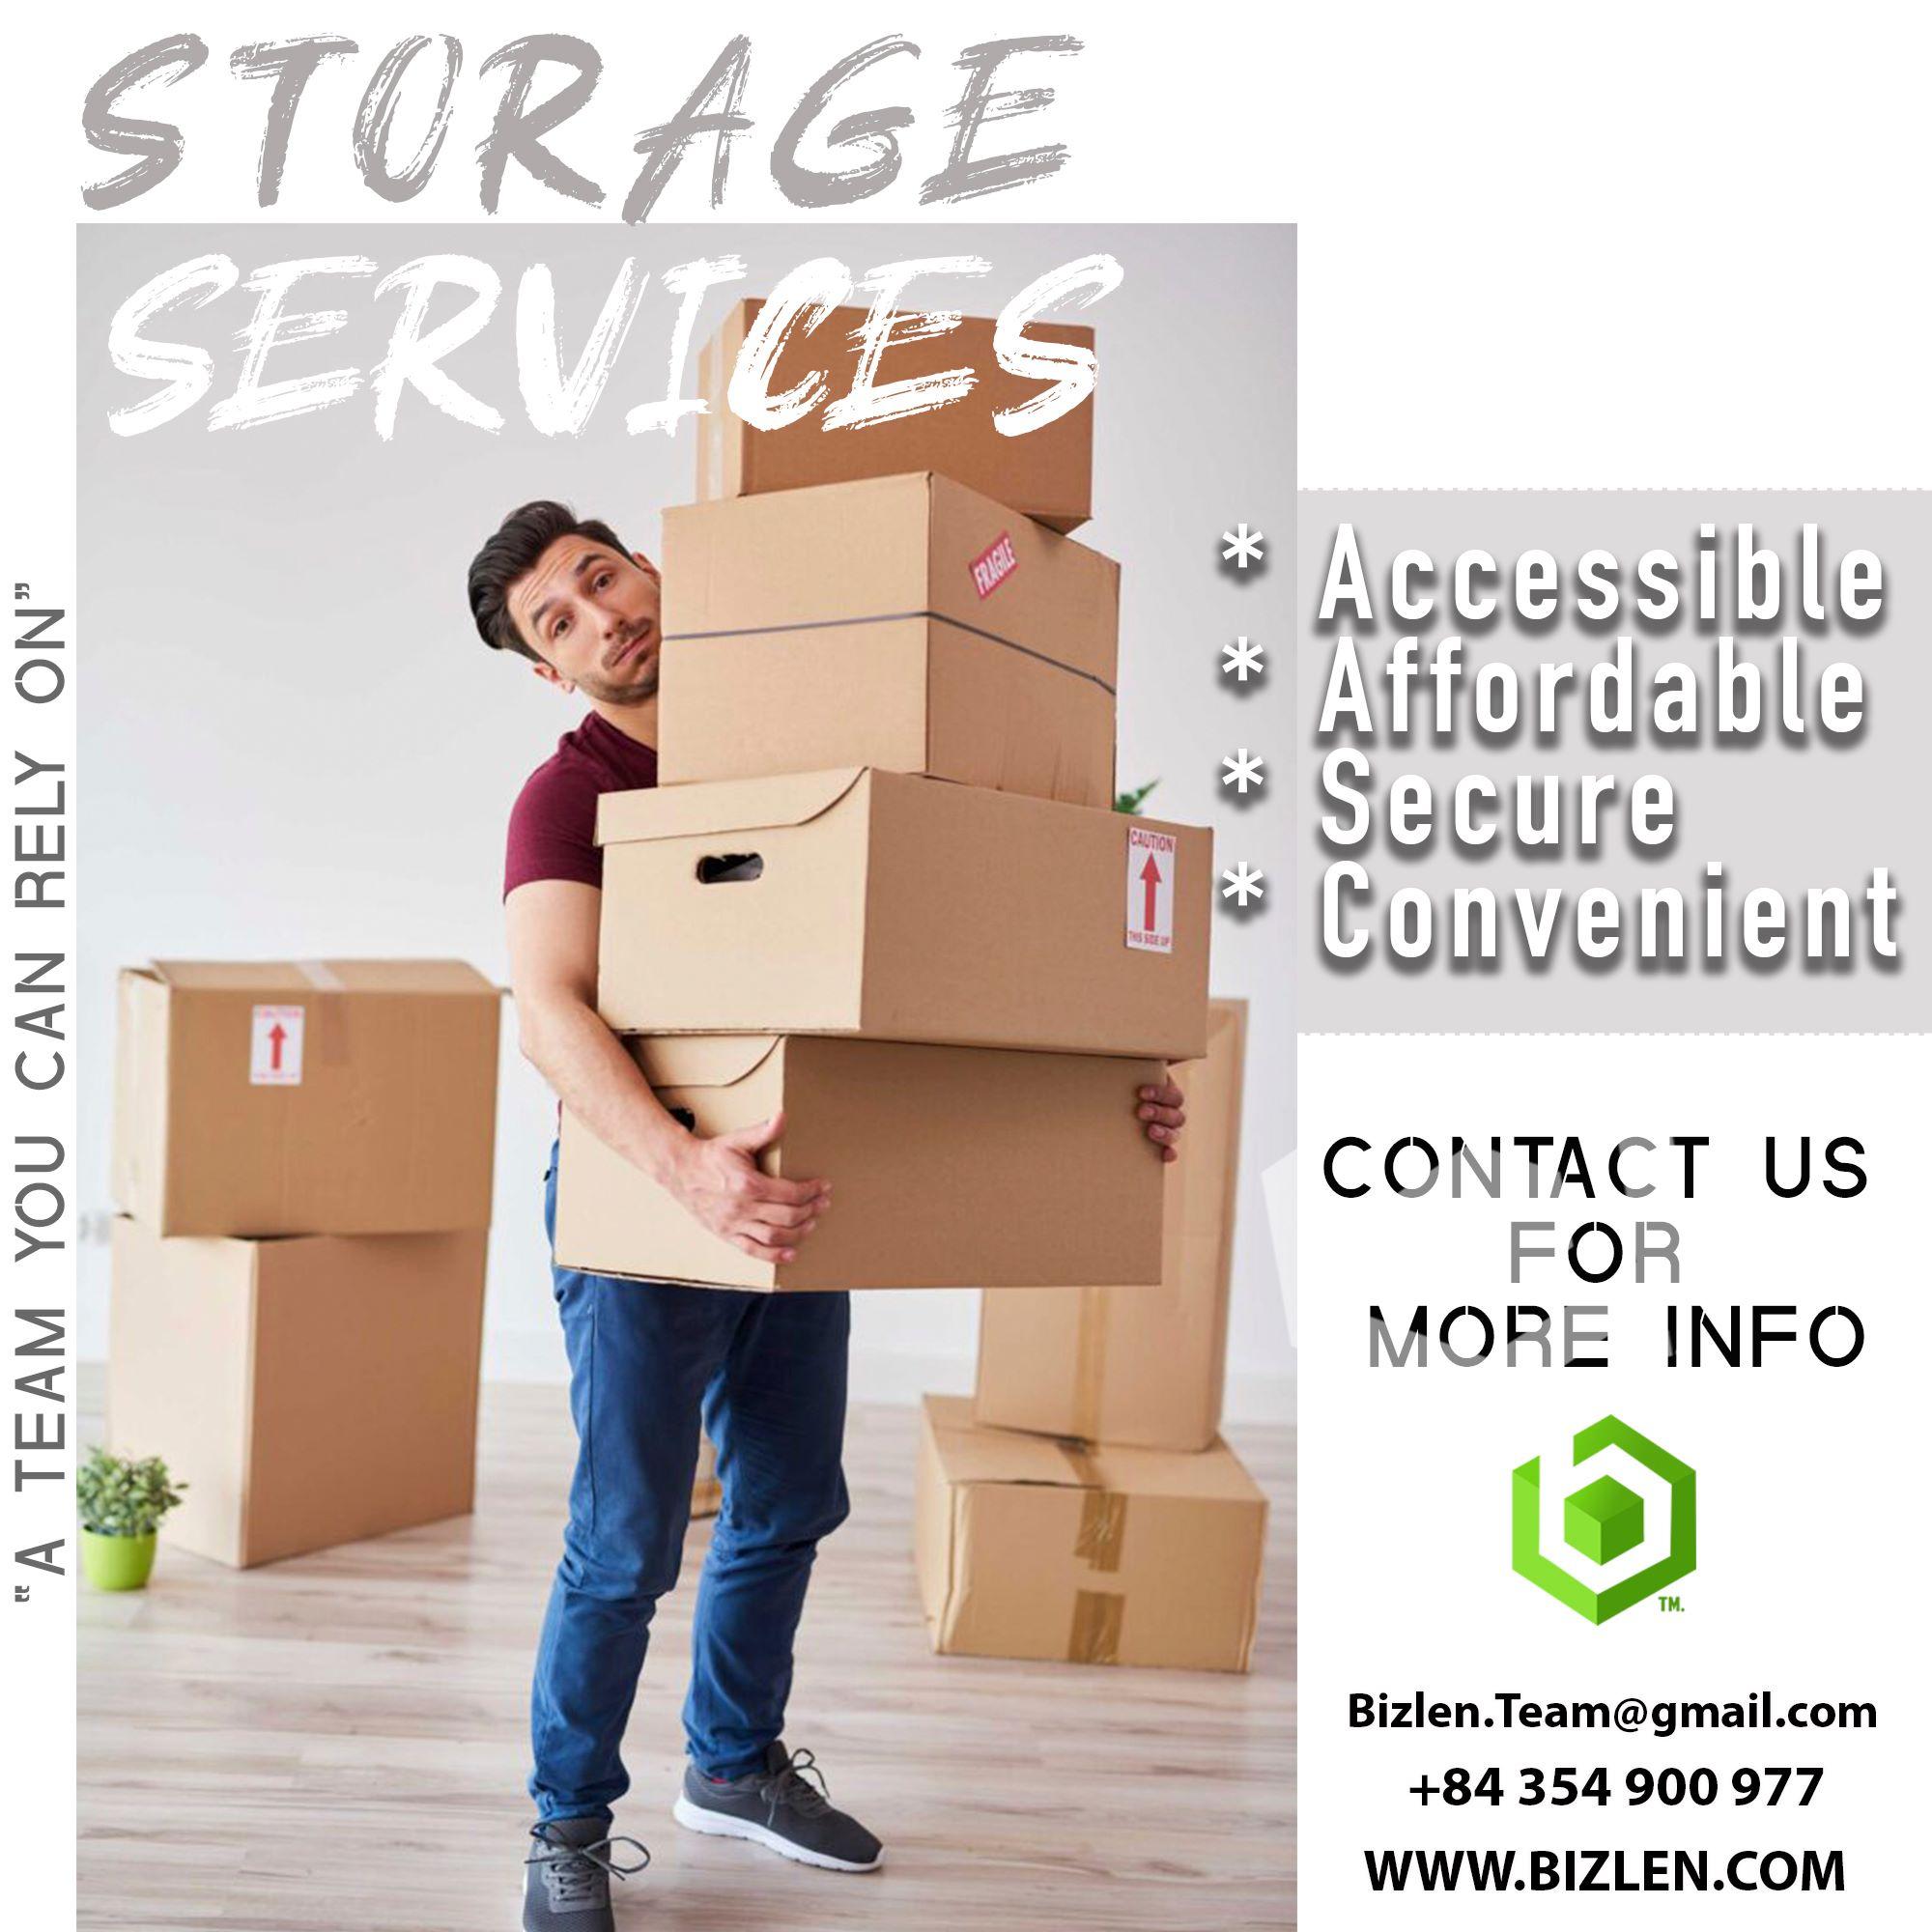 Storage services in Da Nang